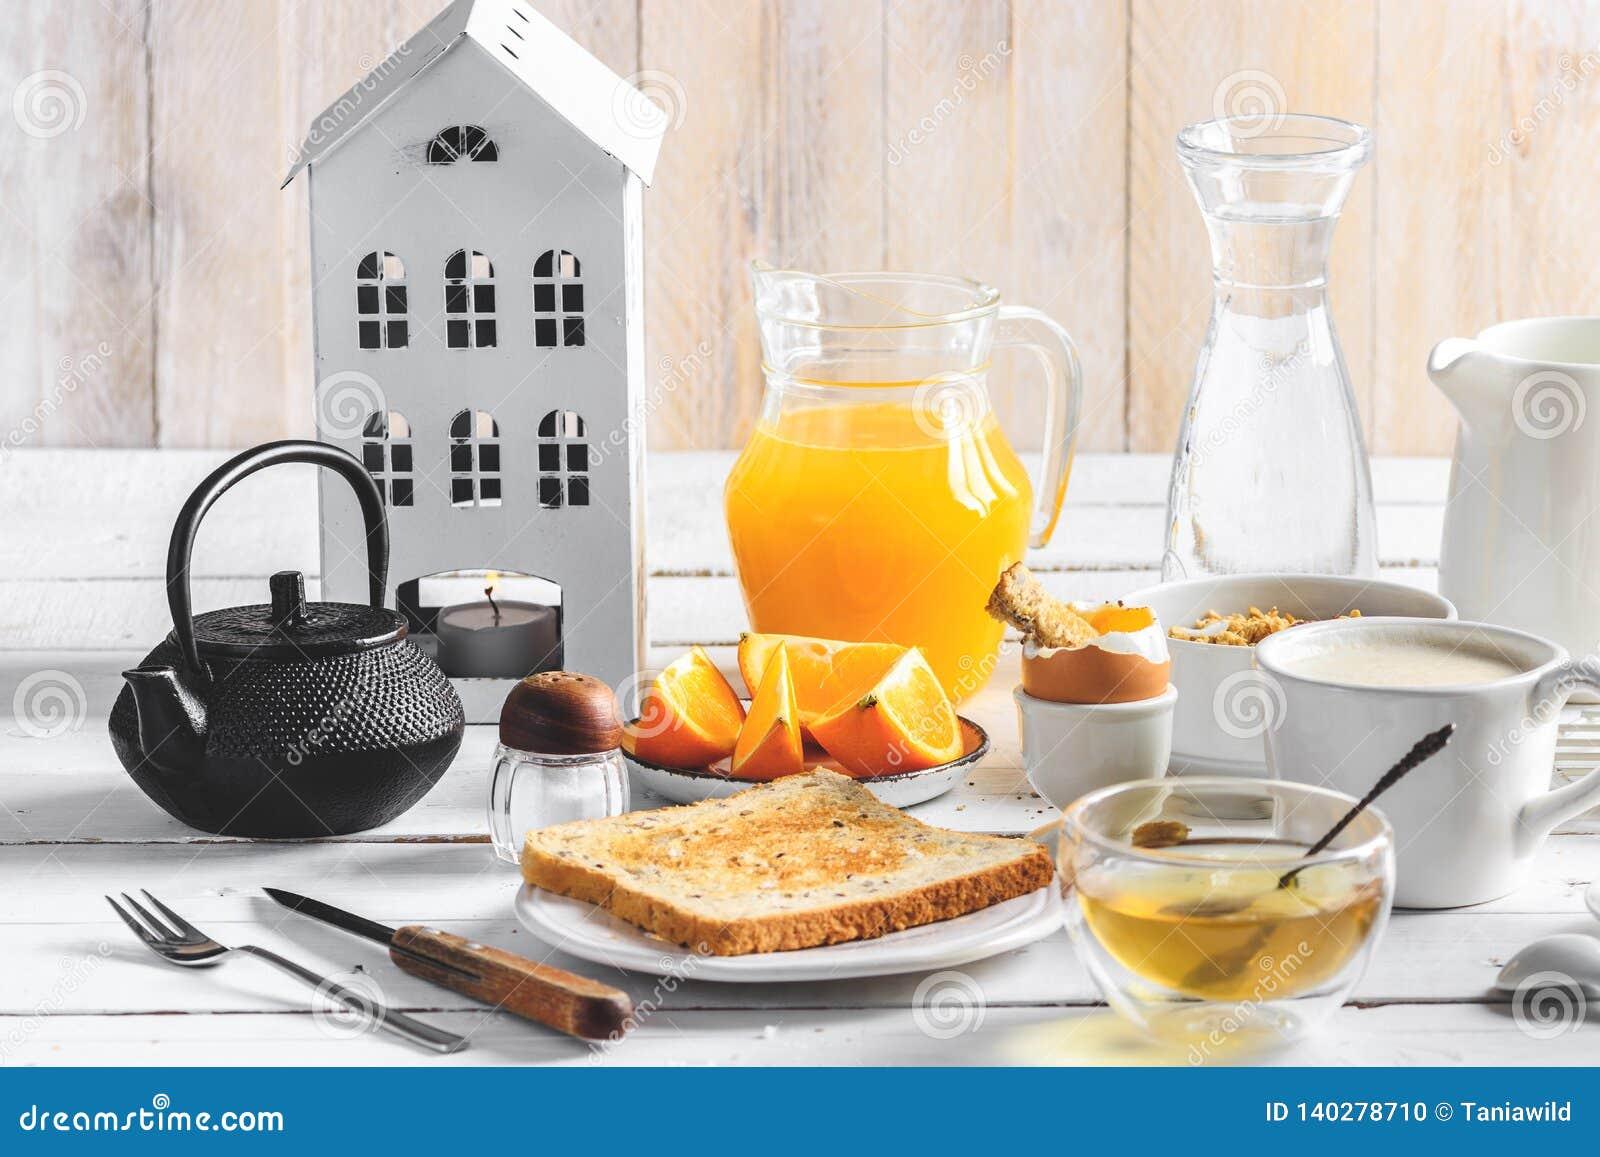 Healthy breakfast eating concept, various morning food - pancakes, soft-boiled egg, toast, oatmeal, granola, fruit, coffee, tea,